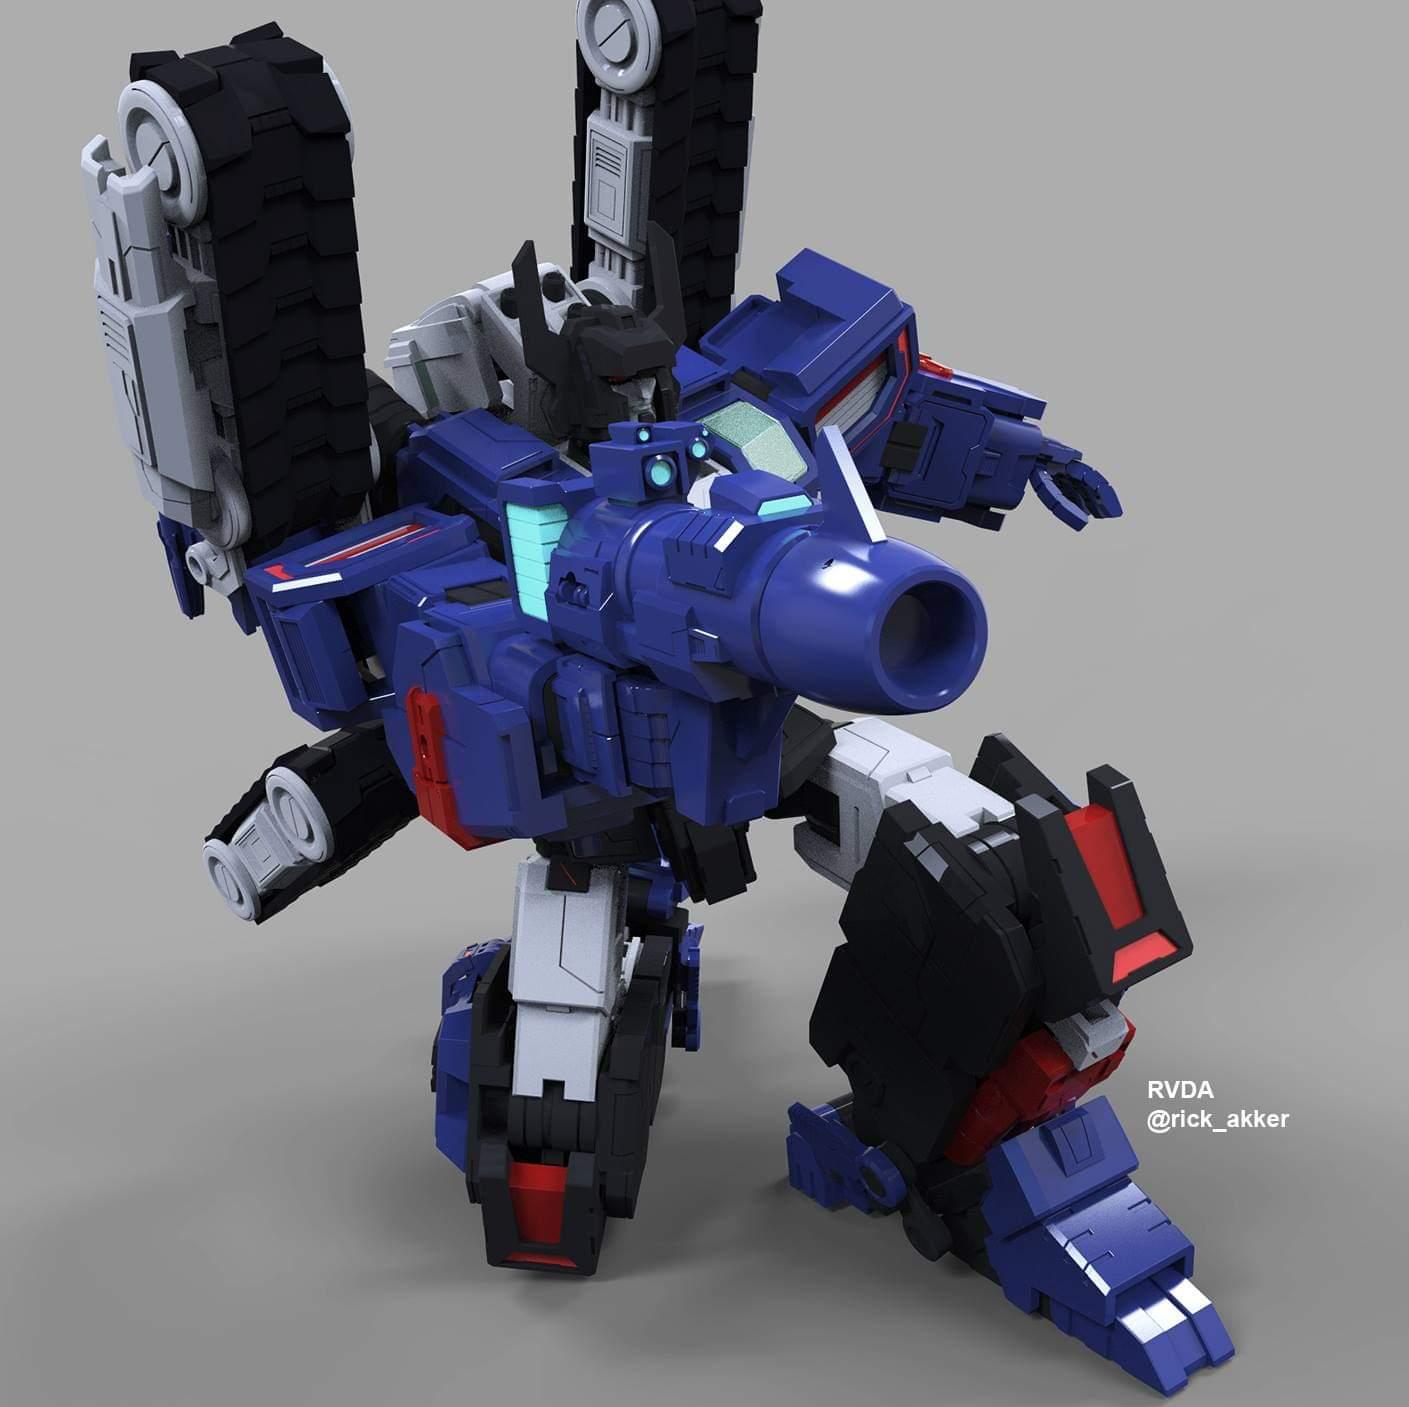 [Mastermind Creations] Produit Tiers - R-50 Supermax - aka Fortress/Forteresse Maximus des BD IDW CV1q4DoQ_o